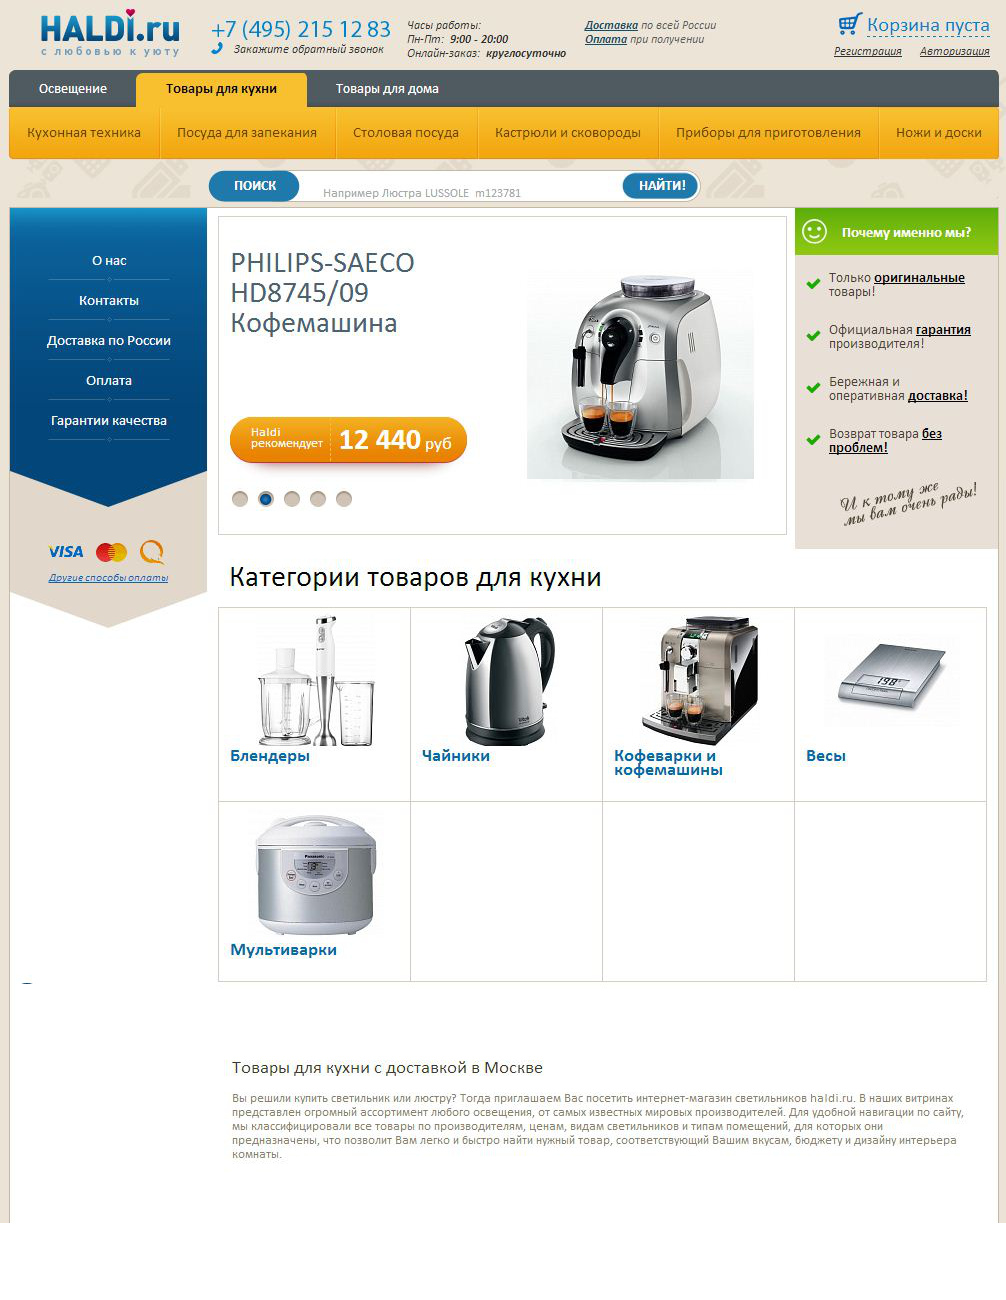 Интернет-магазин - haldi.ru - доработки (Битрикс)